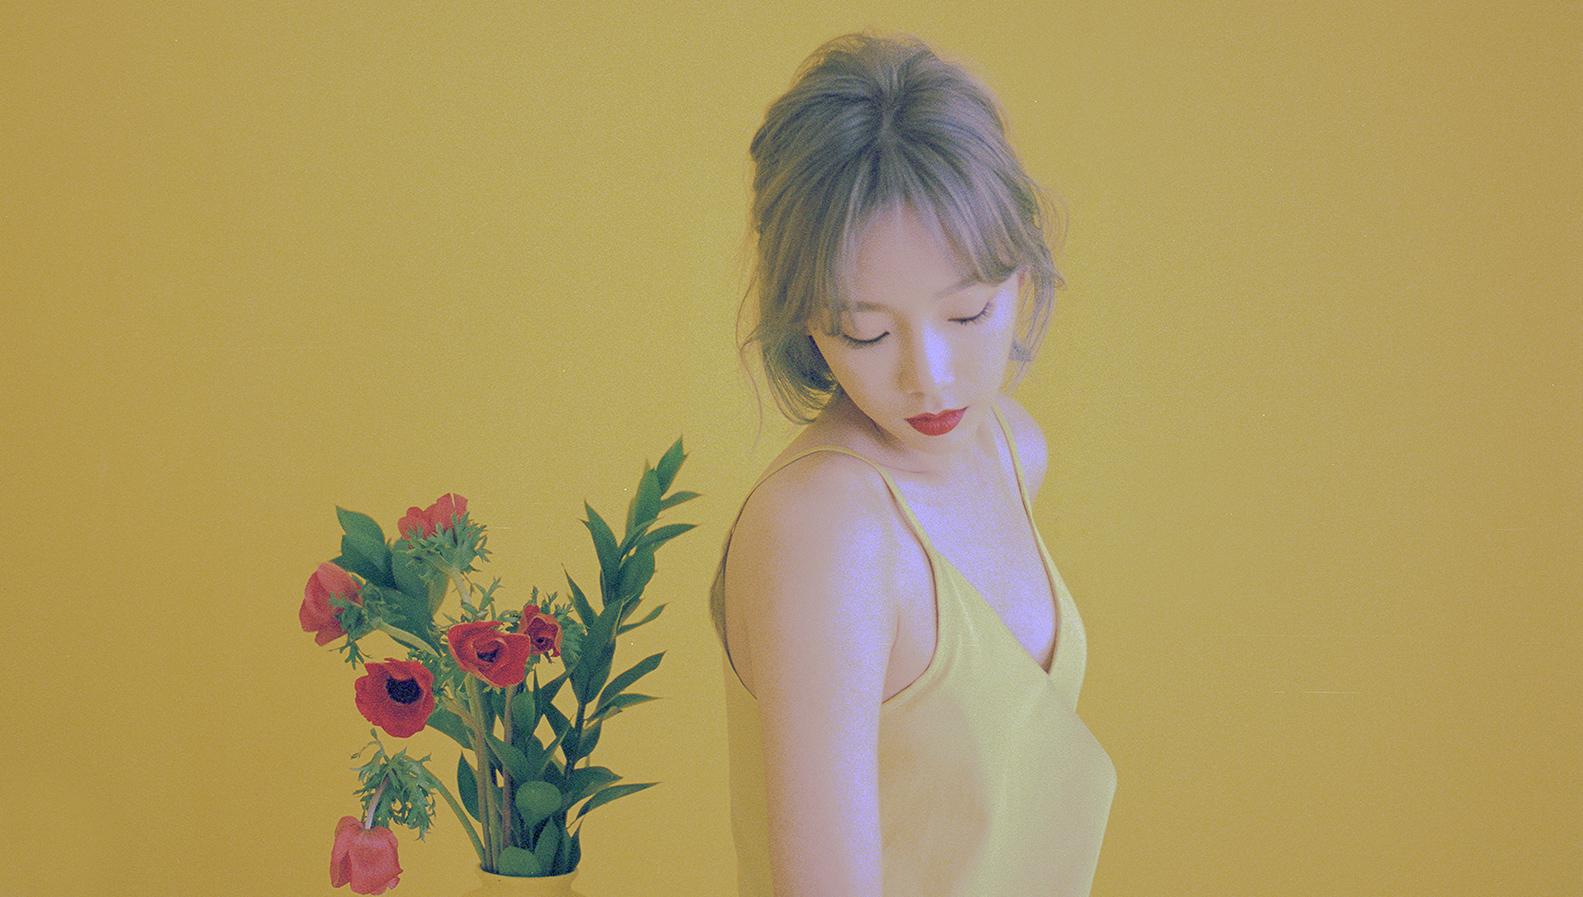 TEAM SNSD: [1ST KOREAN ALBUM] Taeyeon - My Voice / My Voice Deluxe Edition